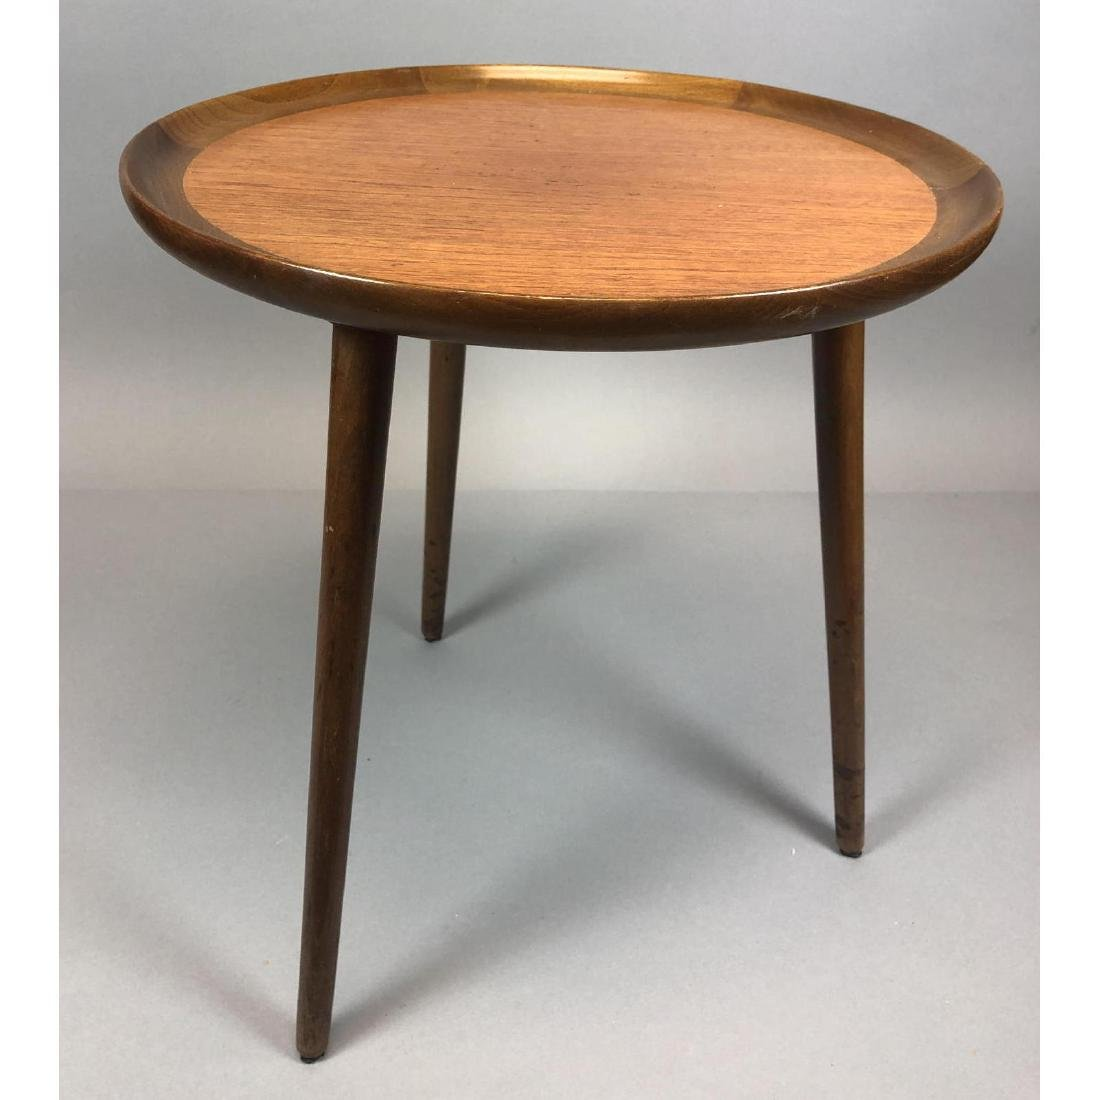 Three Leg Danish Teak SELIG Side Table. Tapered l